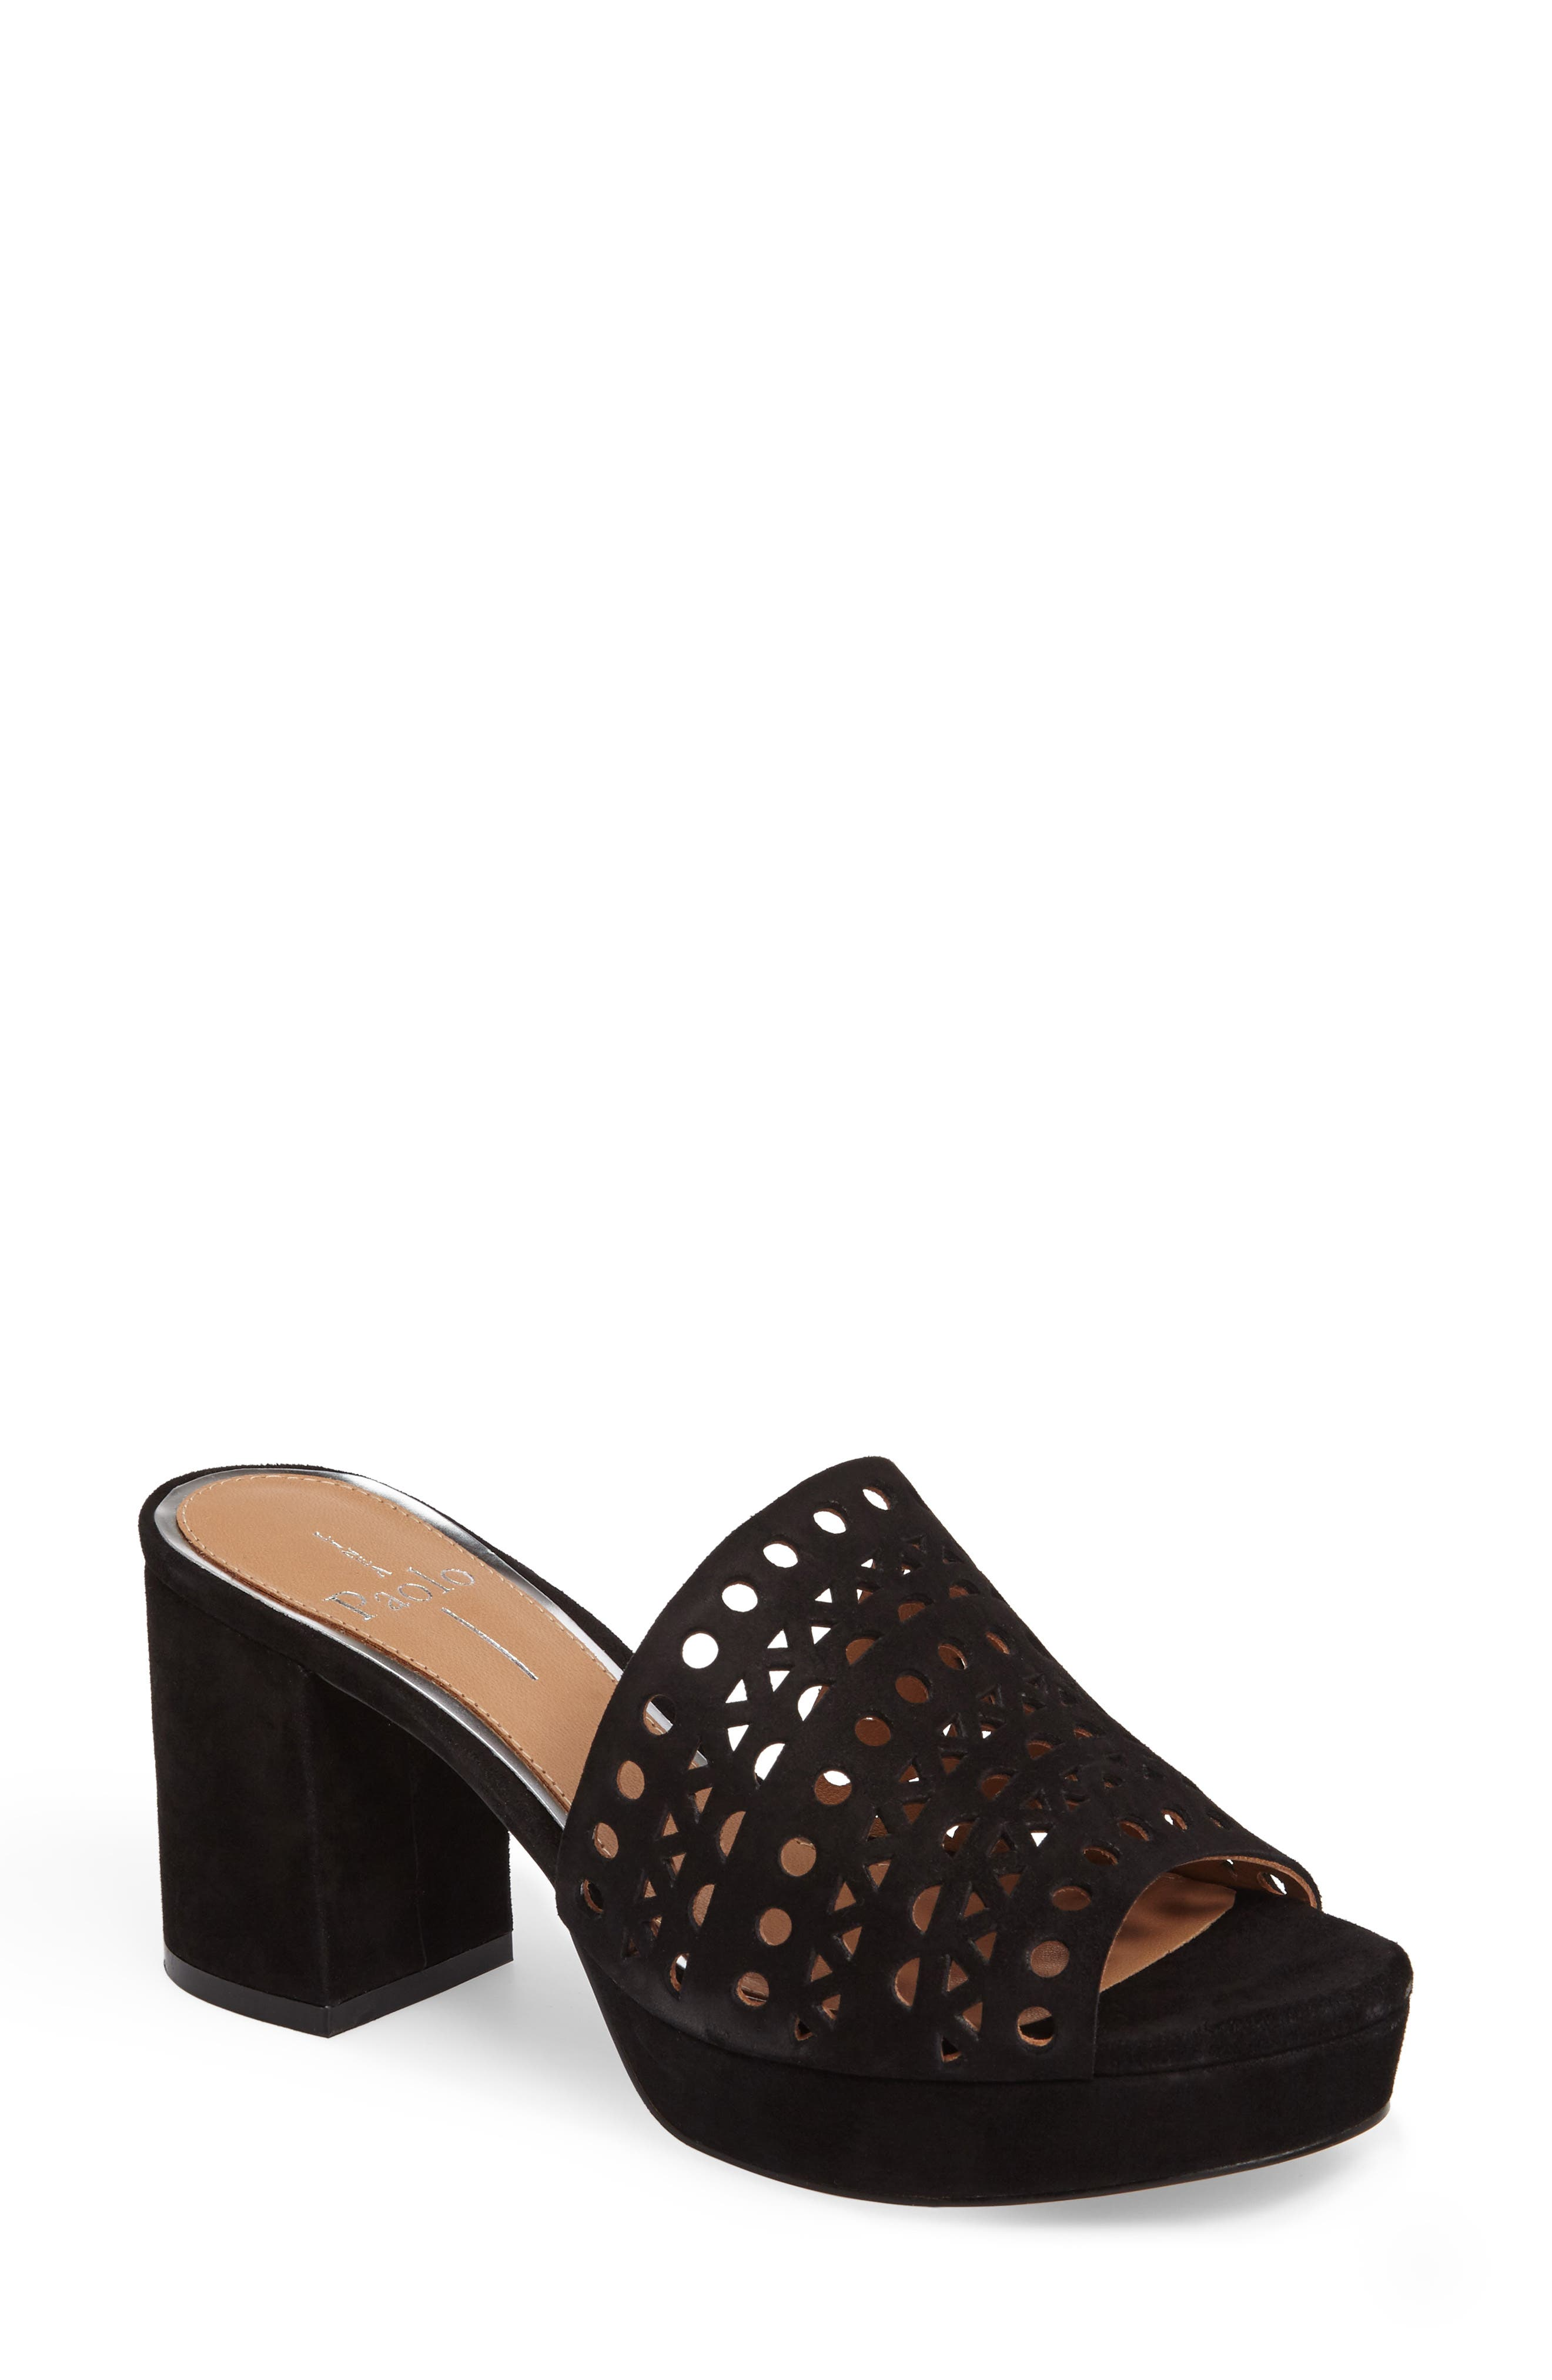 Alternate Image 1 Selected - Linea Paolo Ofra Block Heel Mule (Women)